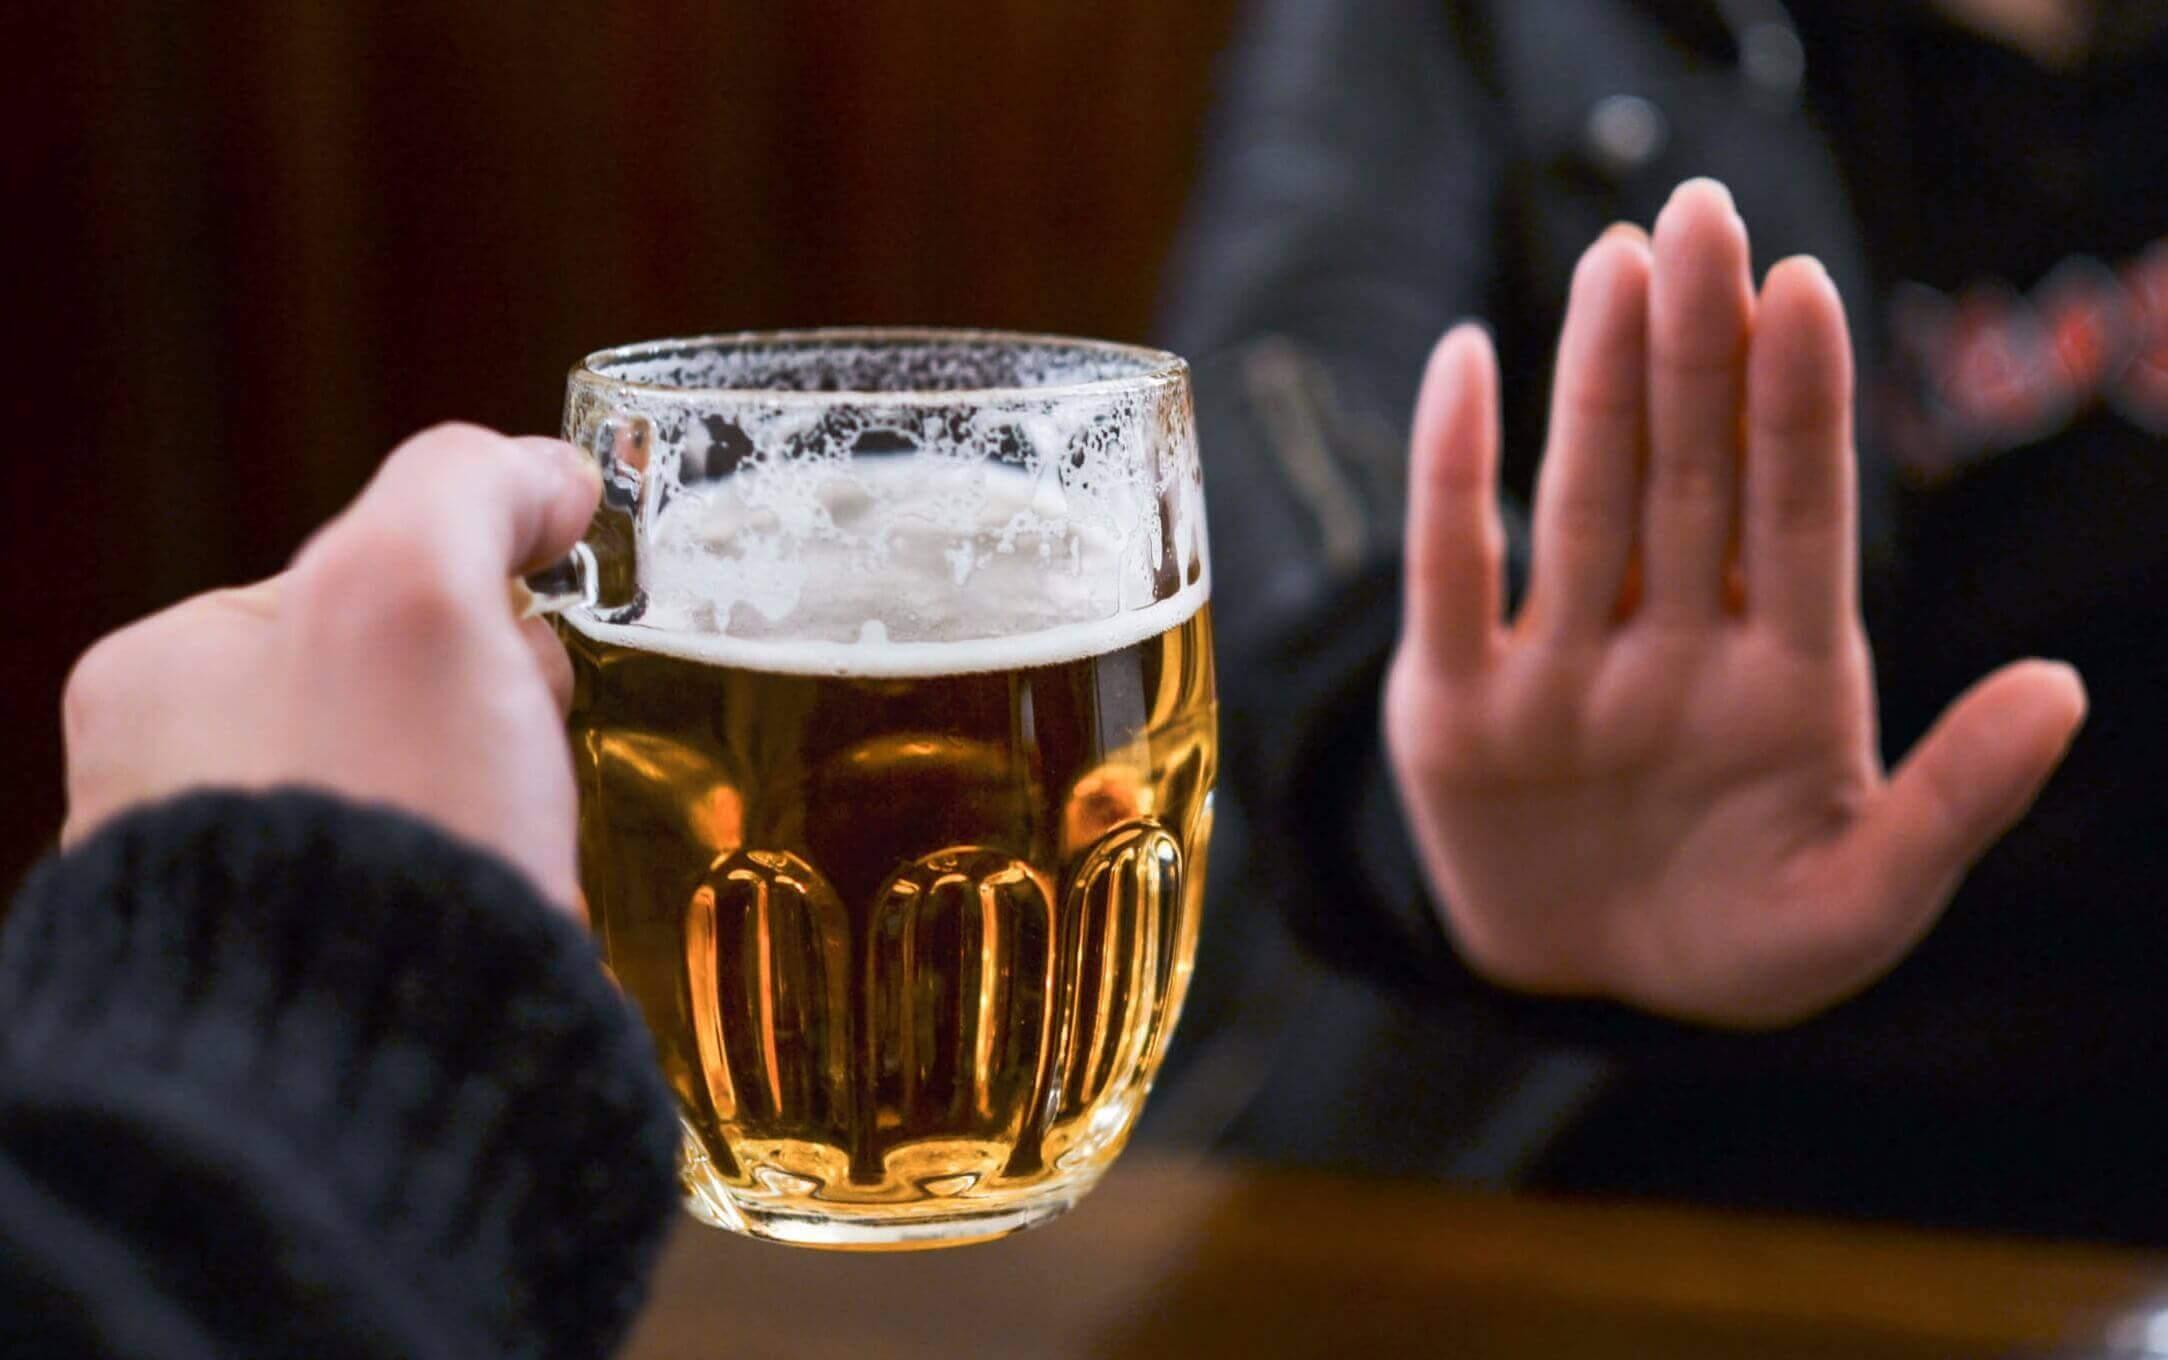 alkohol-brak regeneracji komórek mózgowych